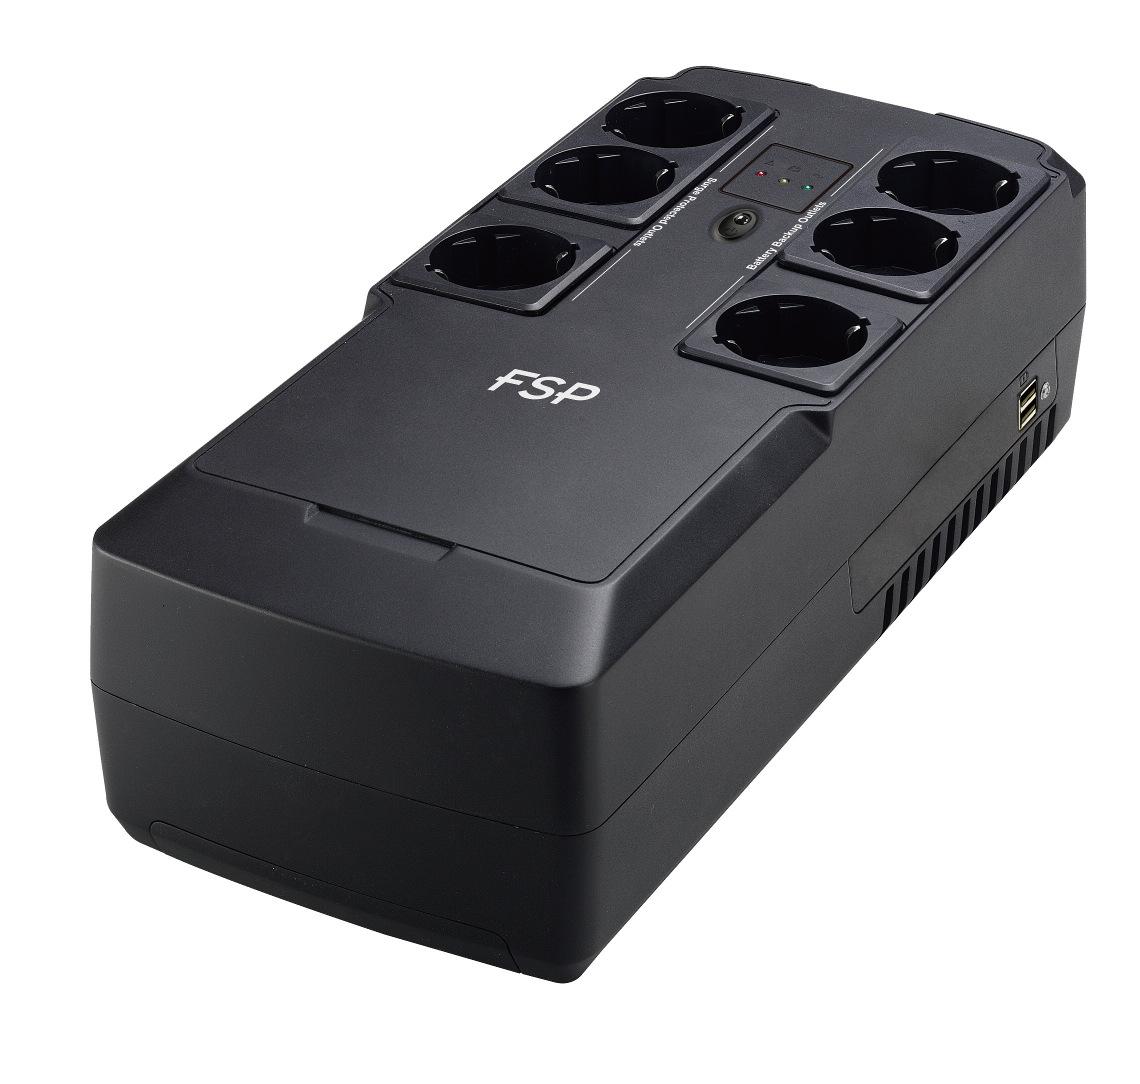 FSP/Fortron UPS NanoFit 600, 600 VA, 2xUSB power, LED, offline - PPF3602301